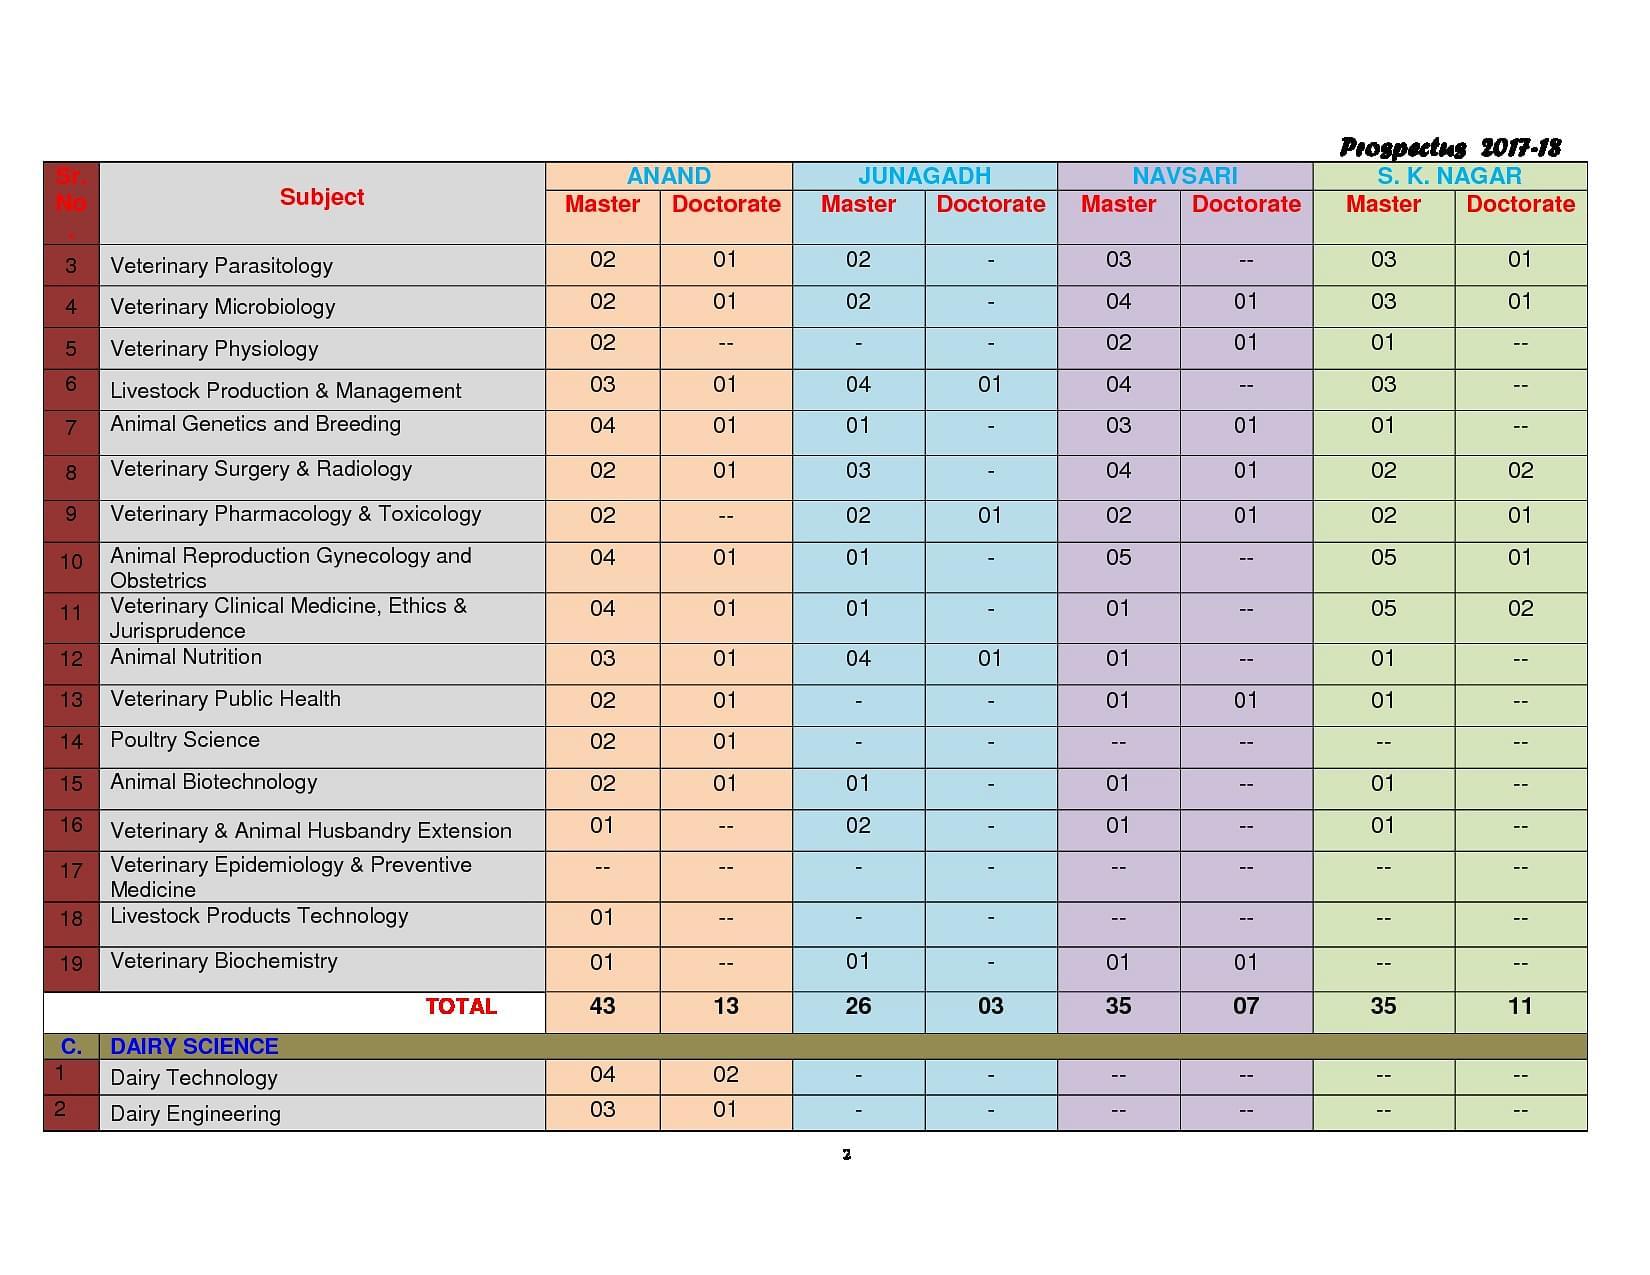 Trace Analysis. Volume 4